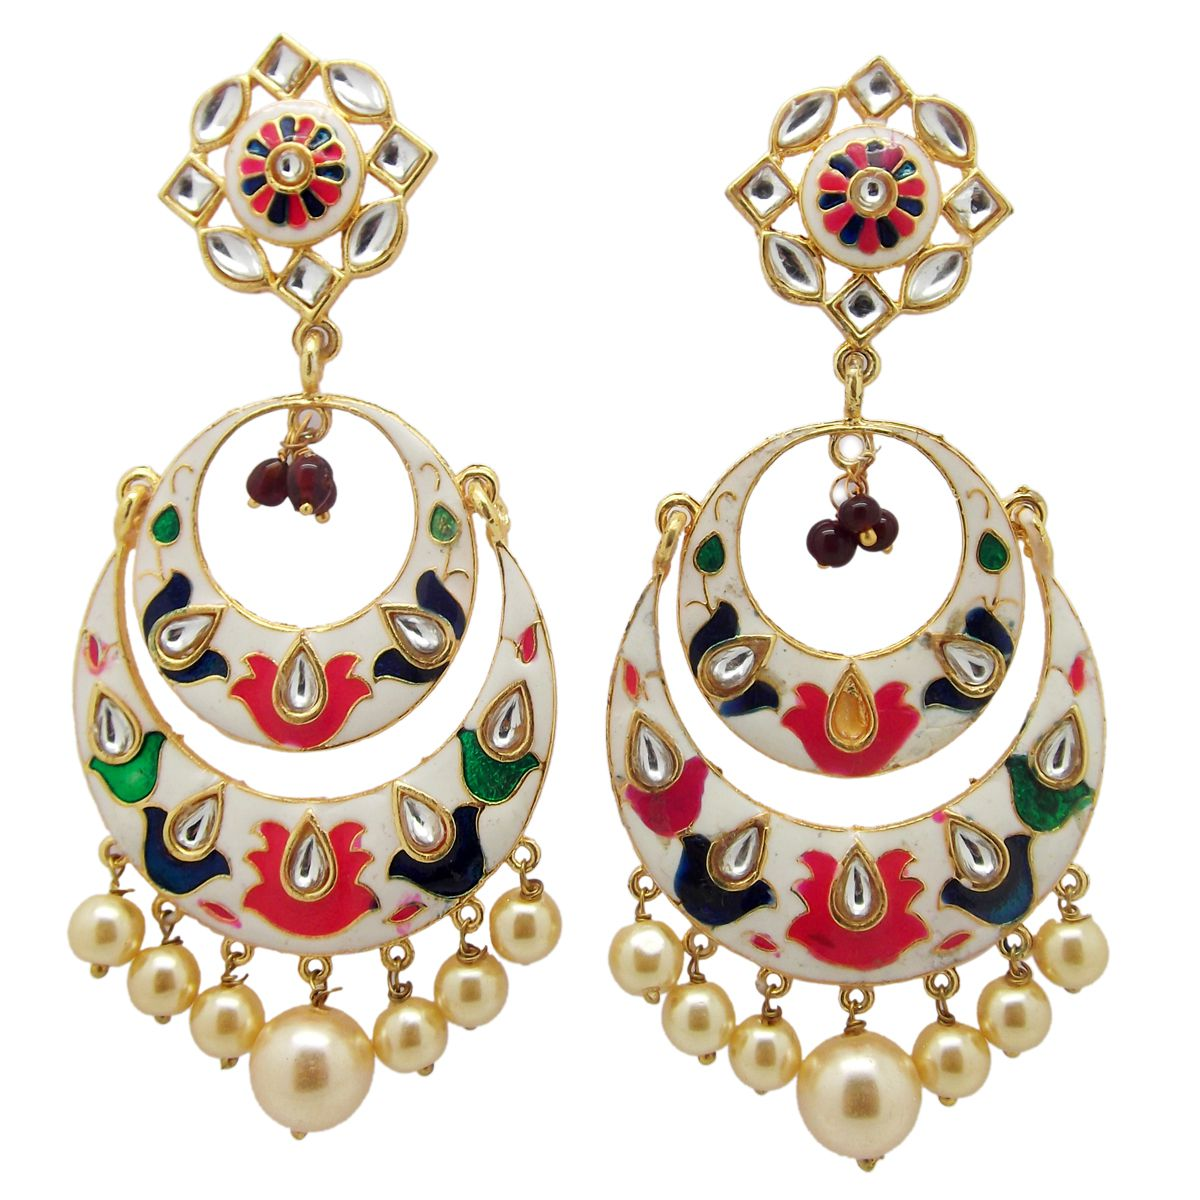 Biyu Kundan Meenakari Hand Painted Pearl White Chandbali Earrings